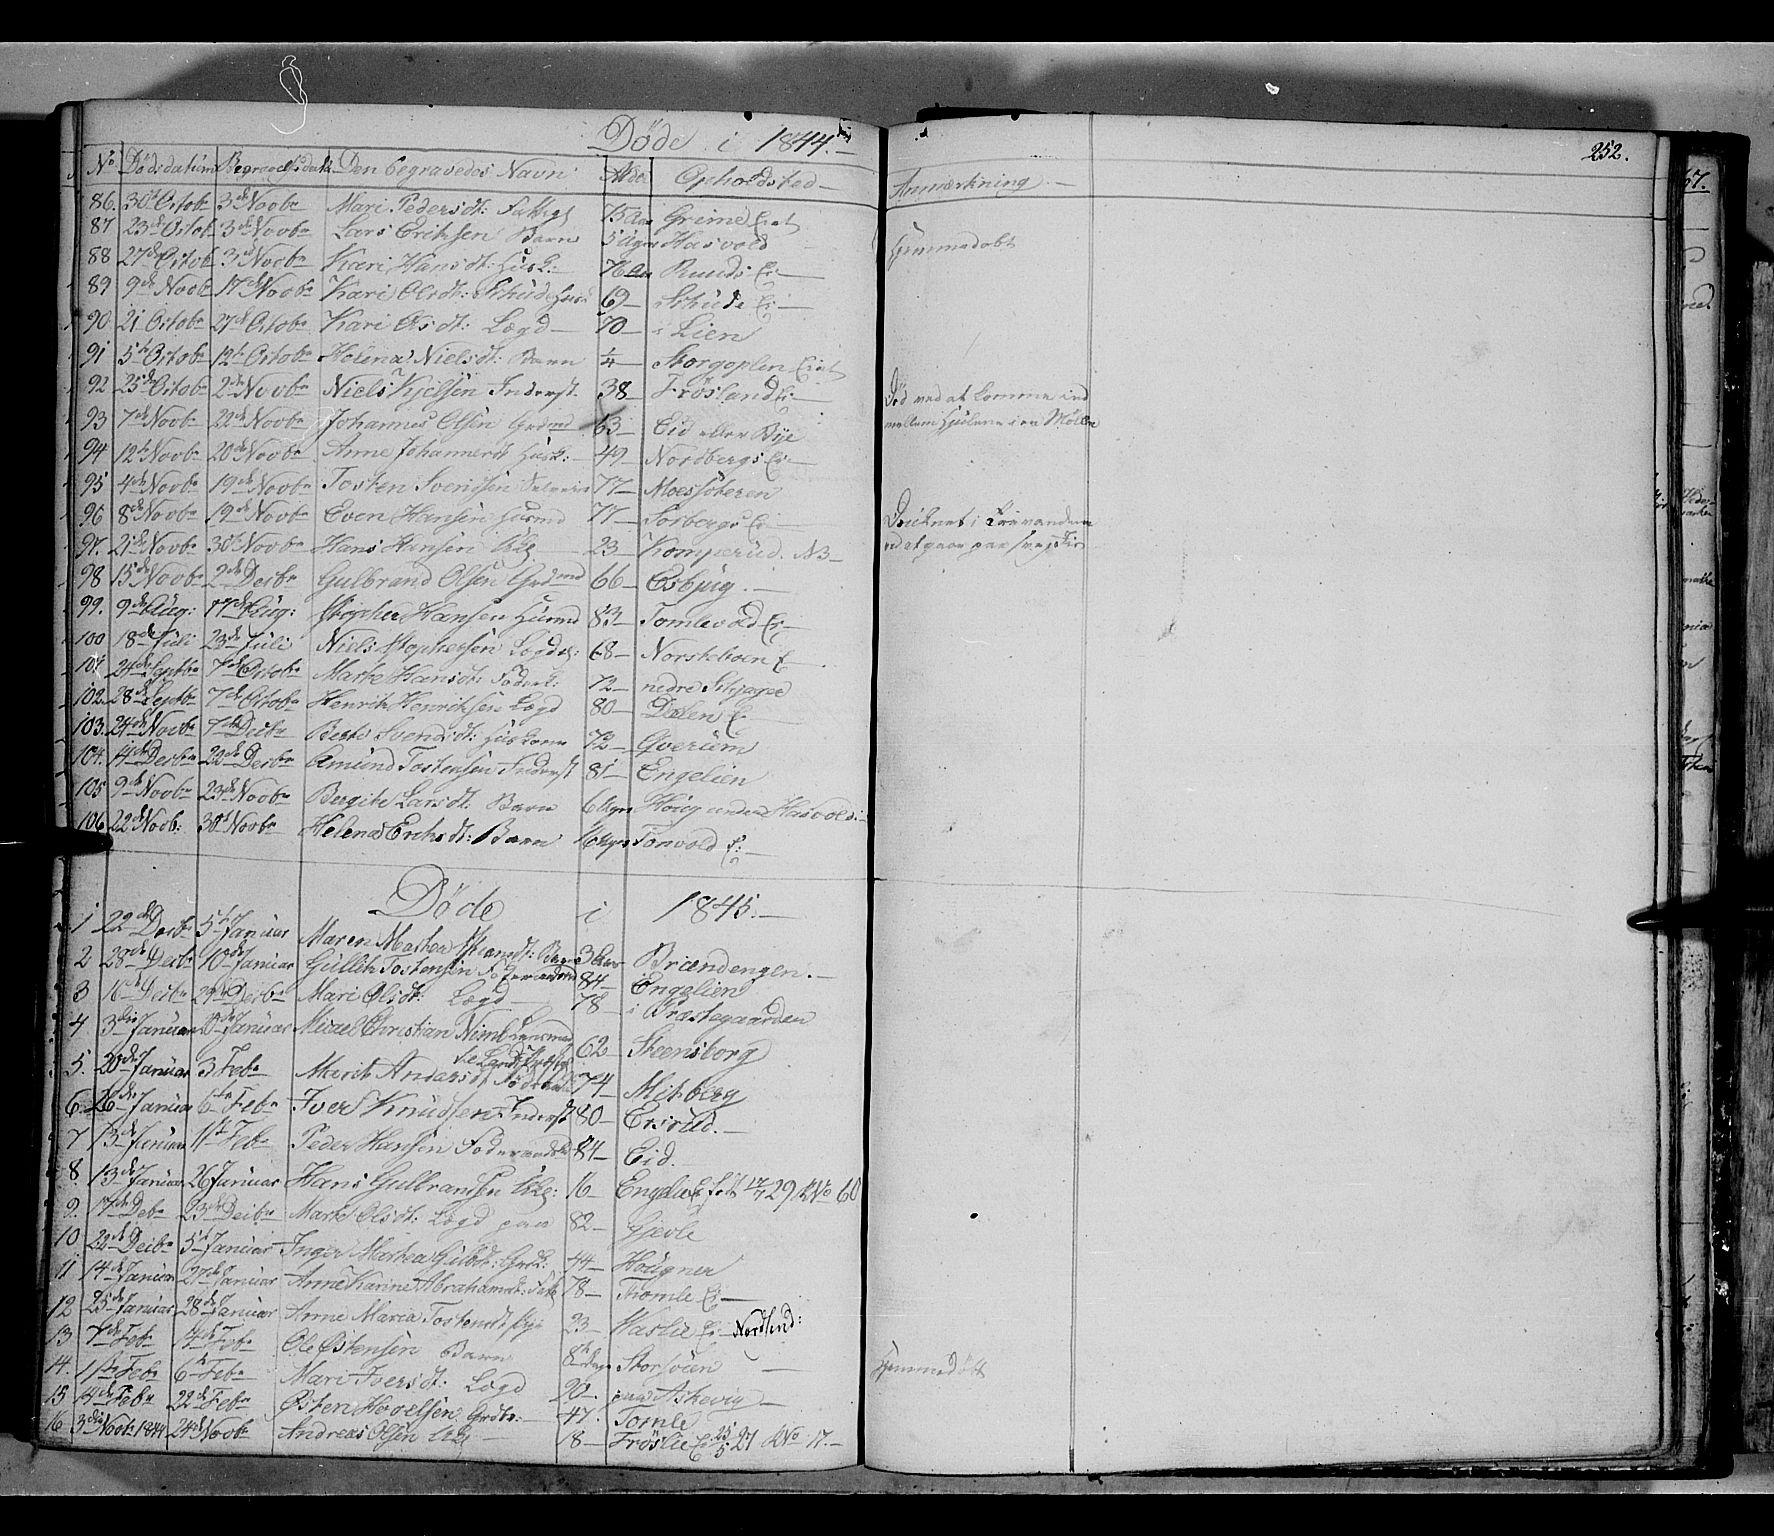 SAH, Land prestekontor, Klokkerbok nr. 2, 1833-1849, s. 252